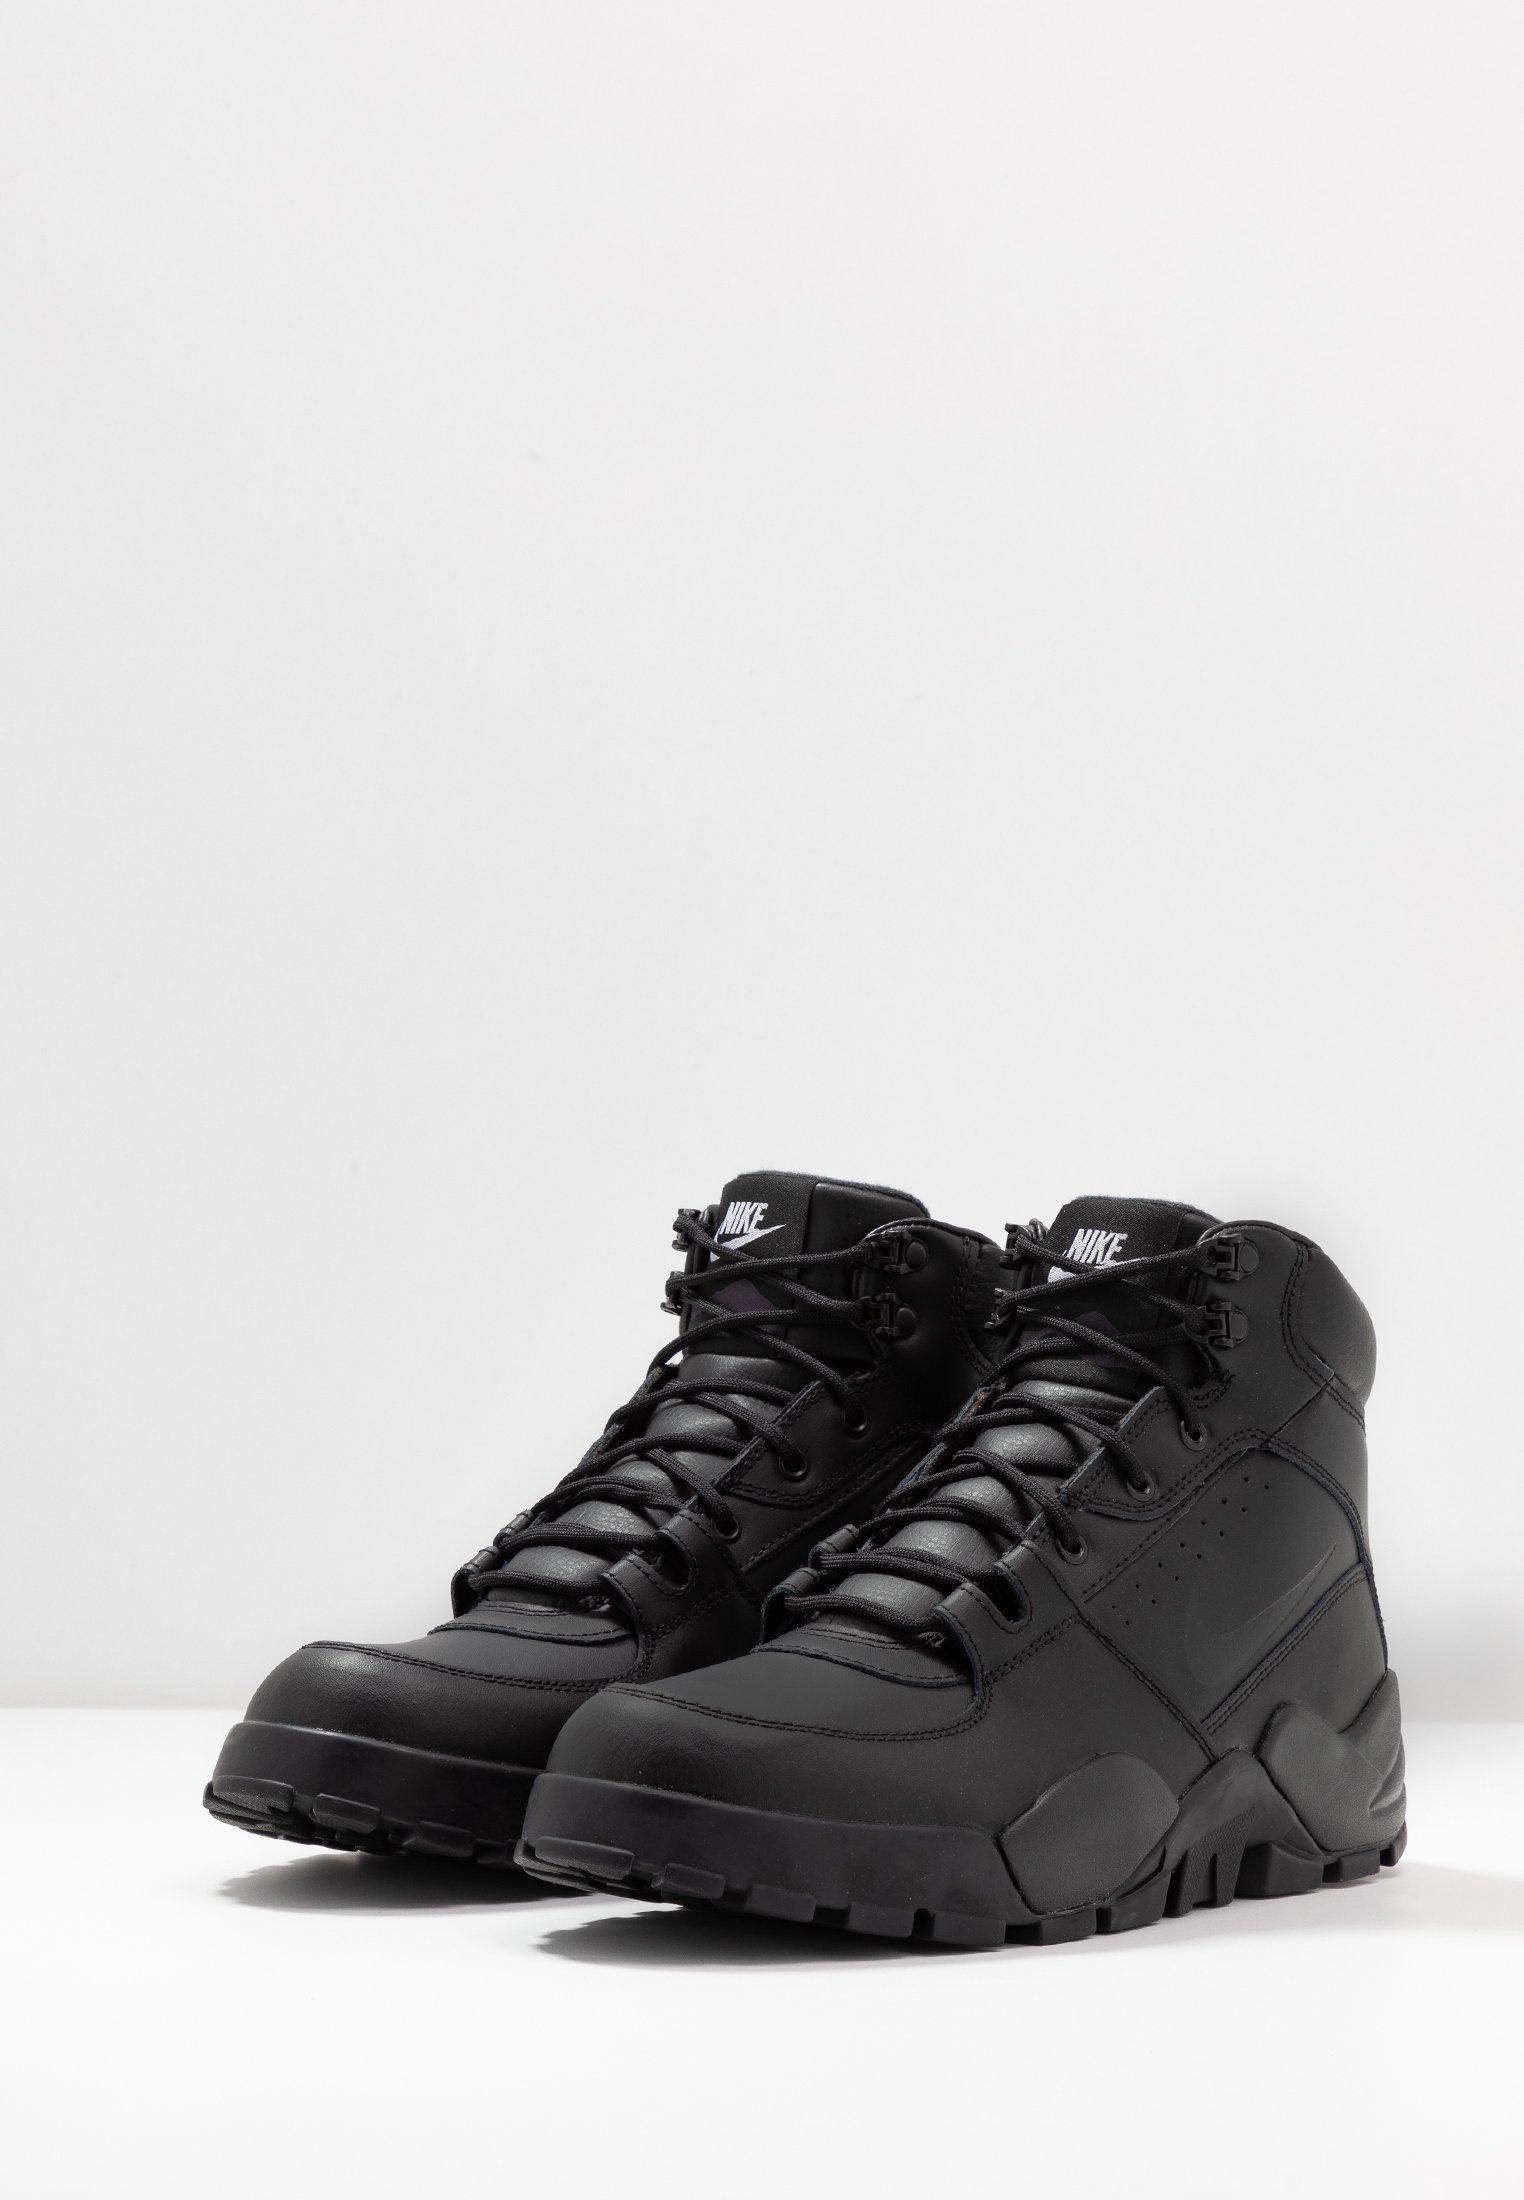 Sportswear Nike anthracite RHYODOMOBaskets montantes black white LSMVpqUGz